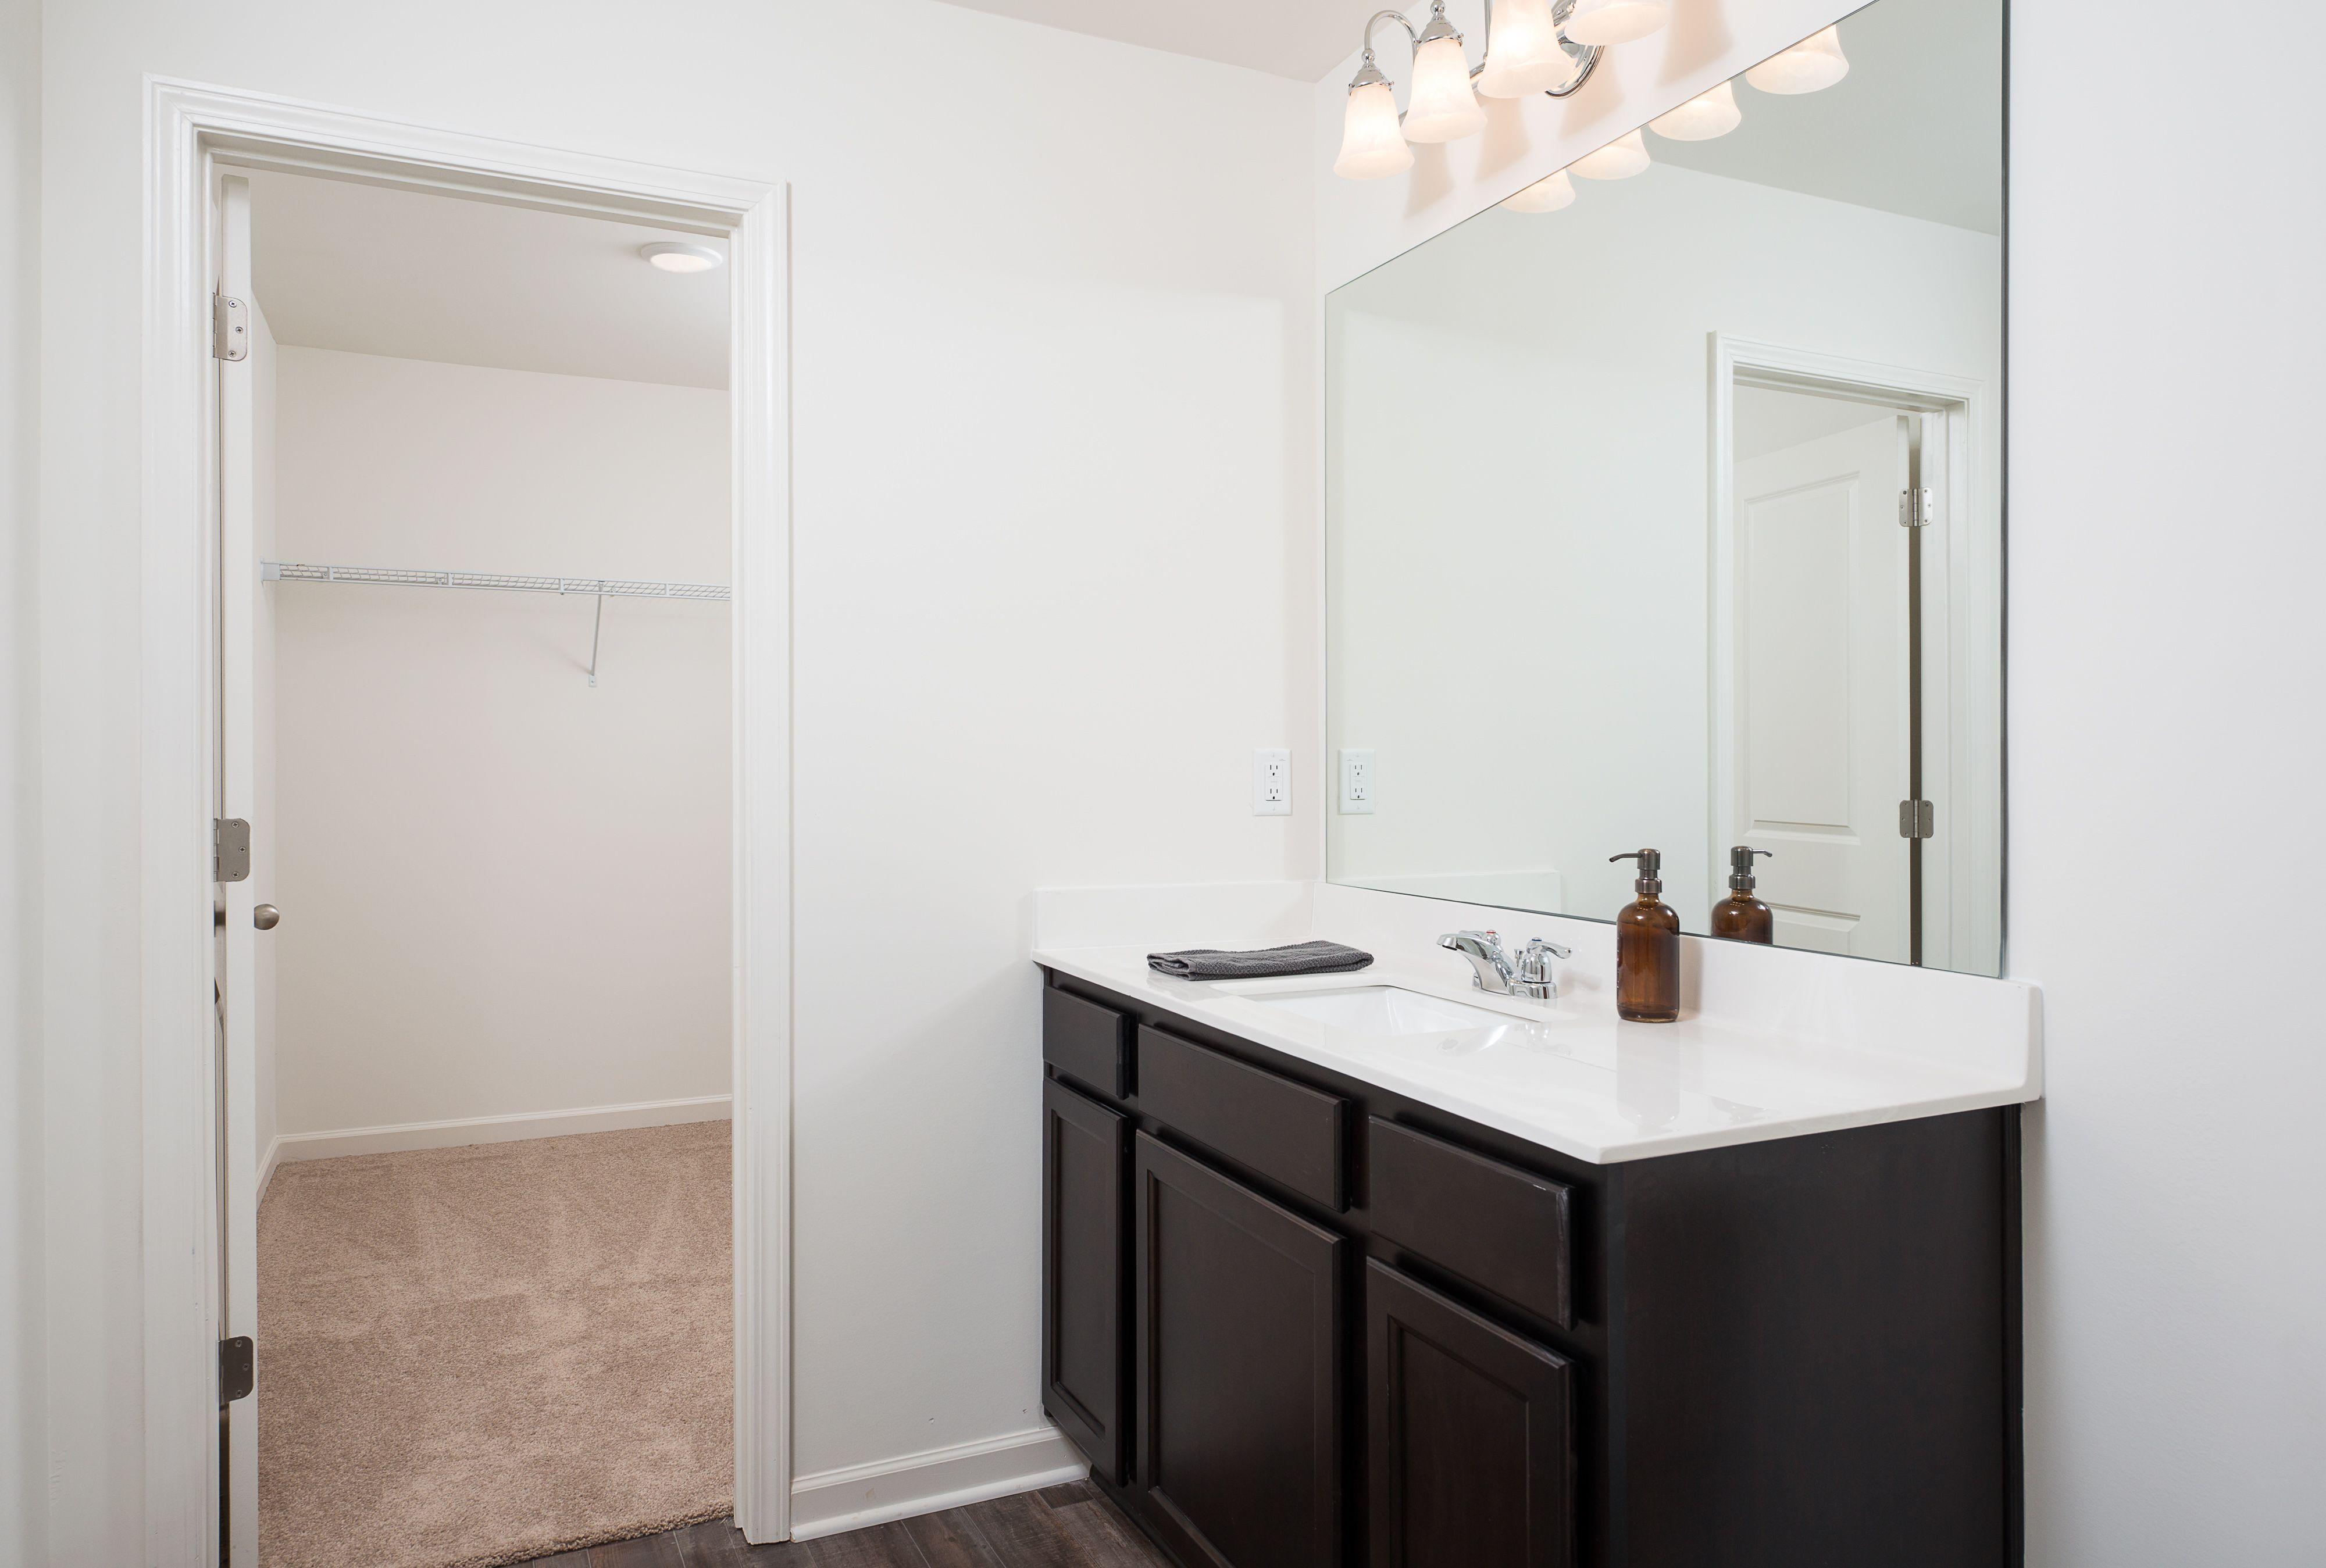 Bathroom featured in the Galaxy By Starlight Homes in Atlanta, GA